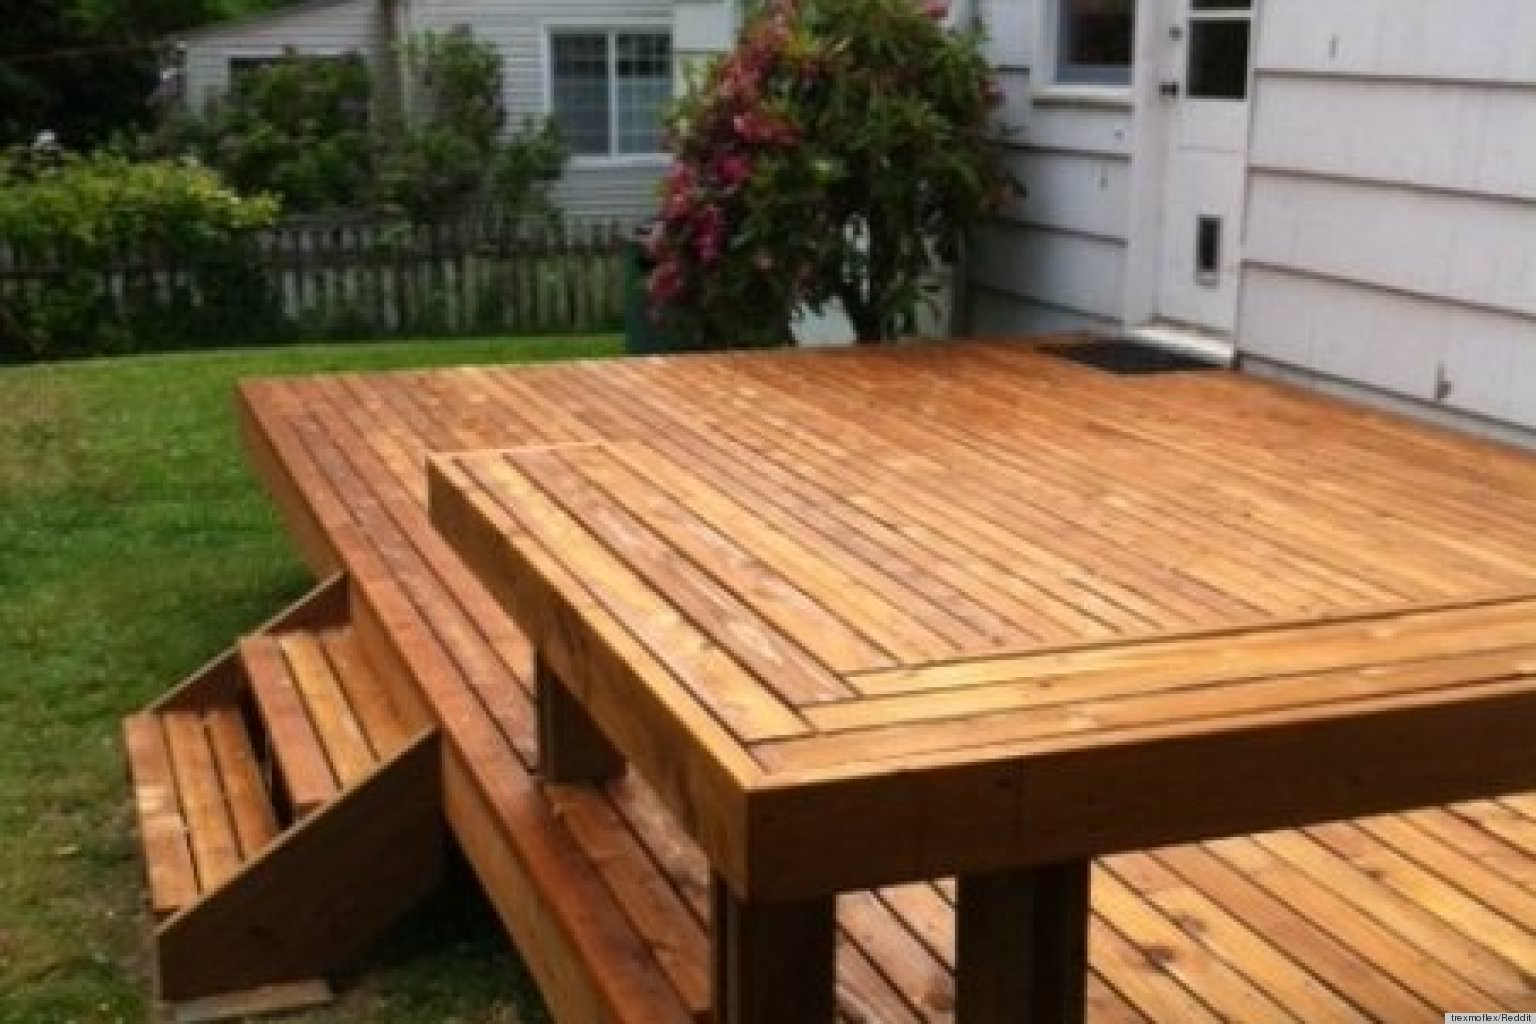 Decks & Light Construction Projects | Winston Salem ... on Patio Structure Designs id=60609